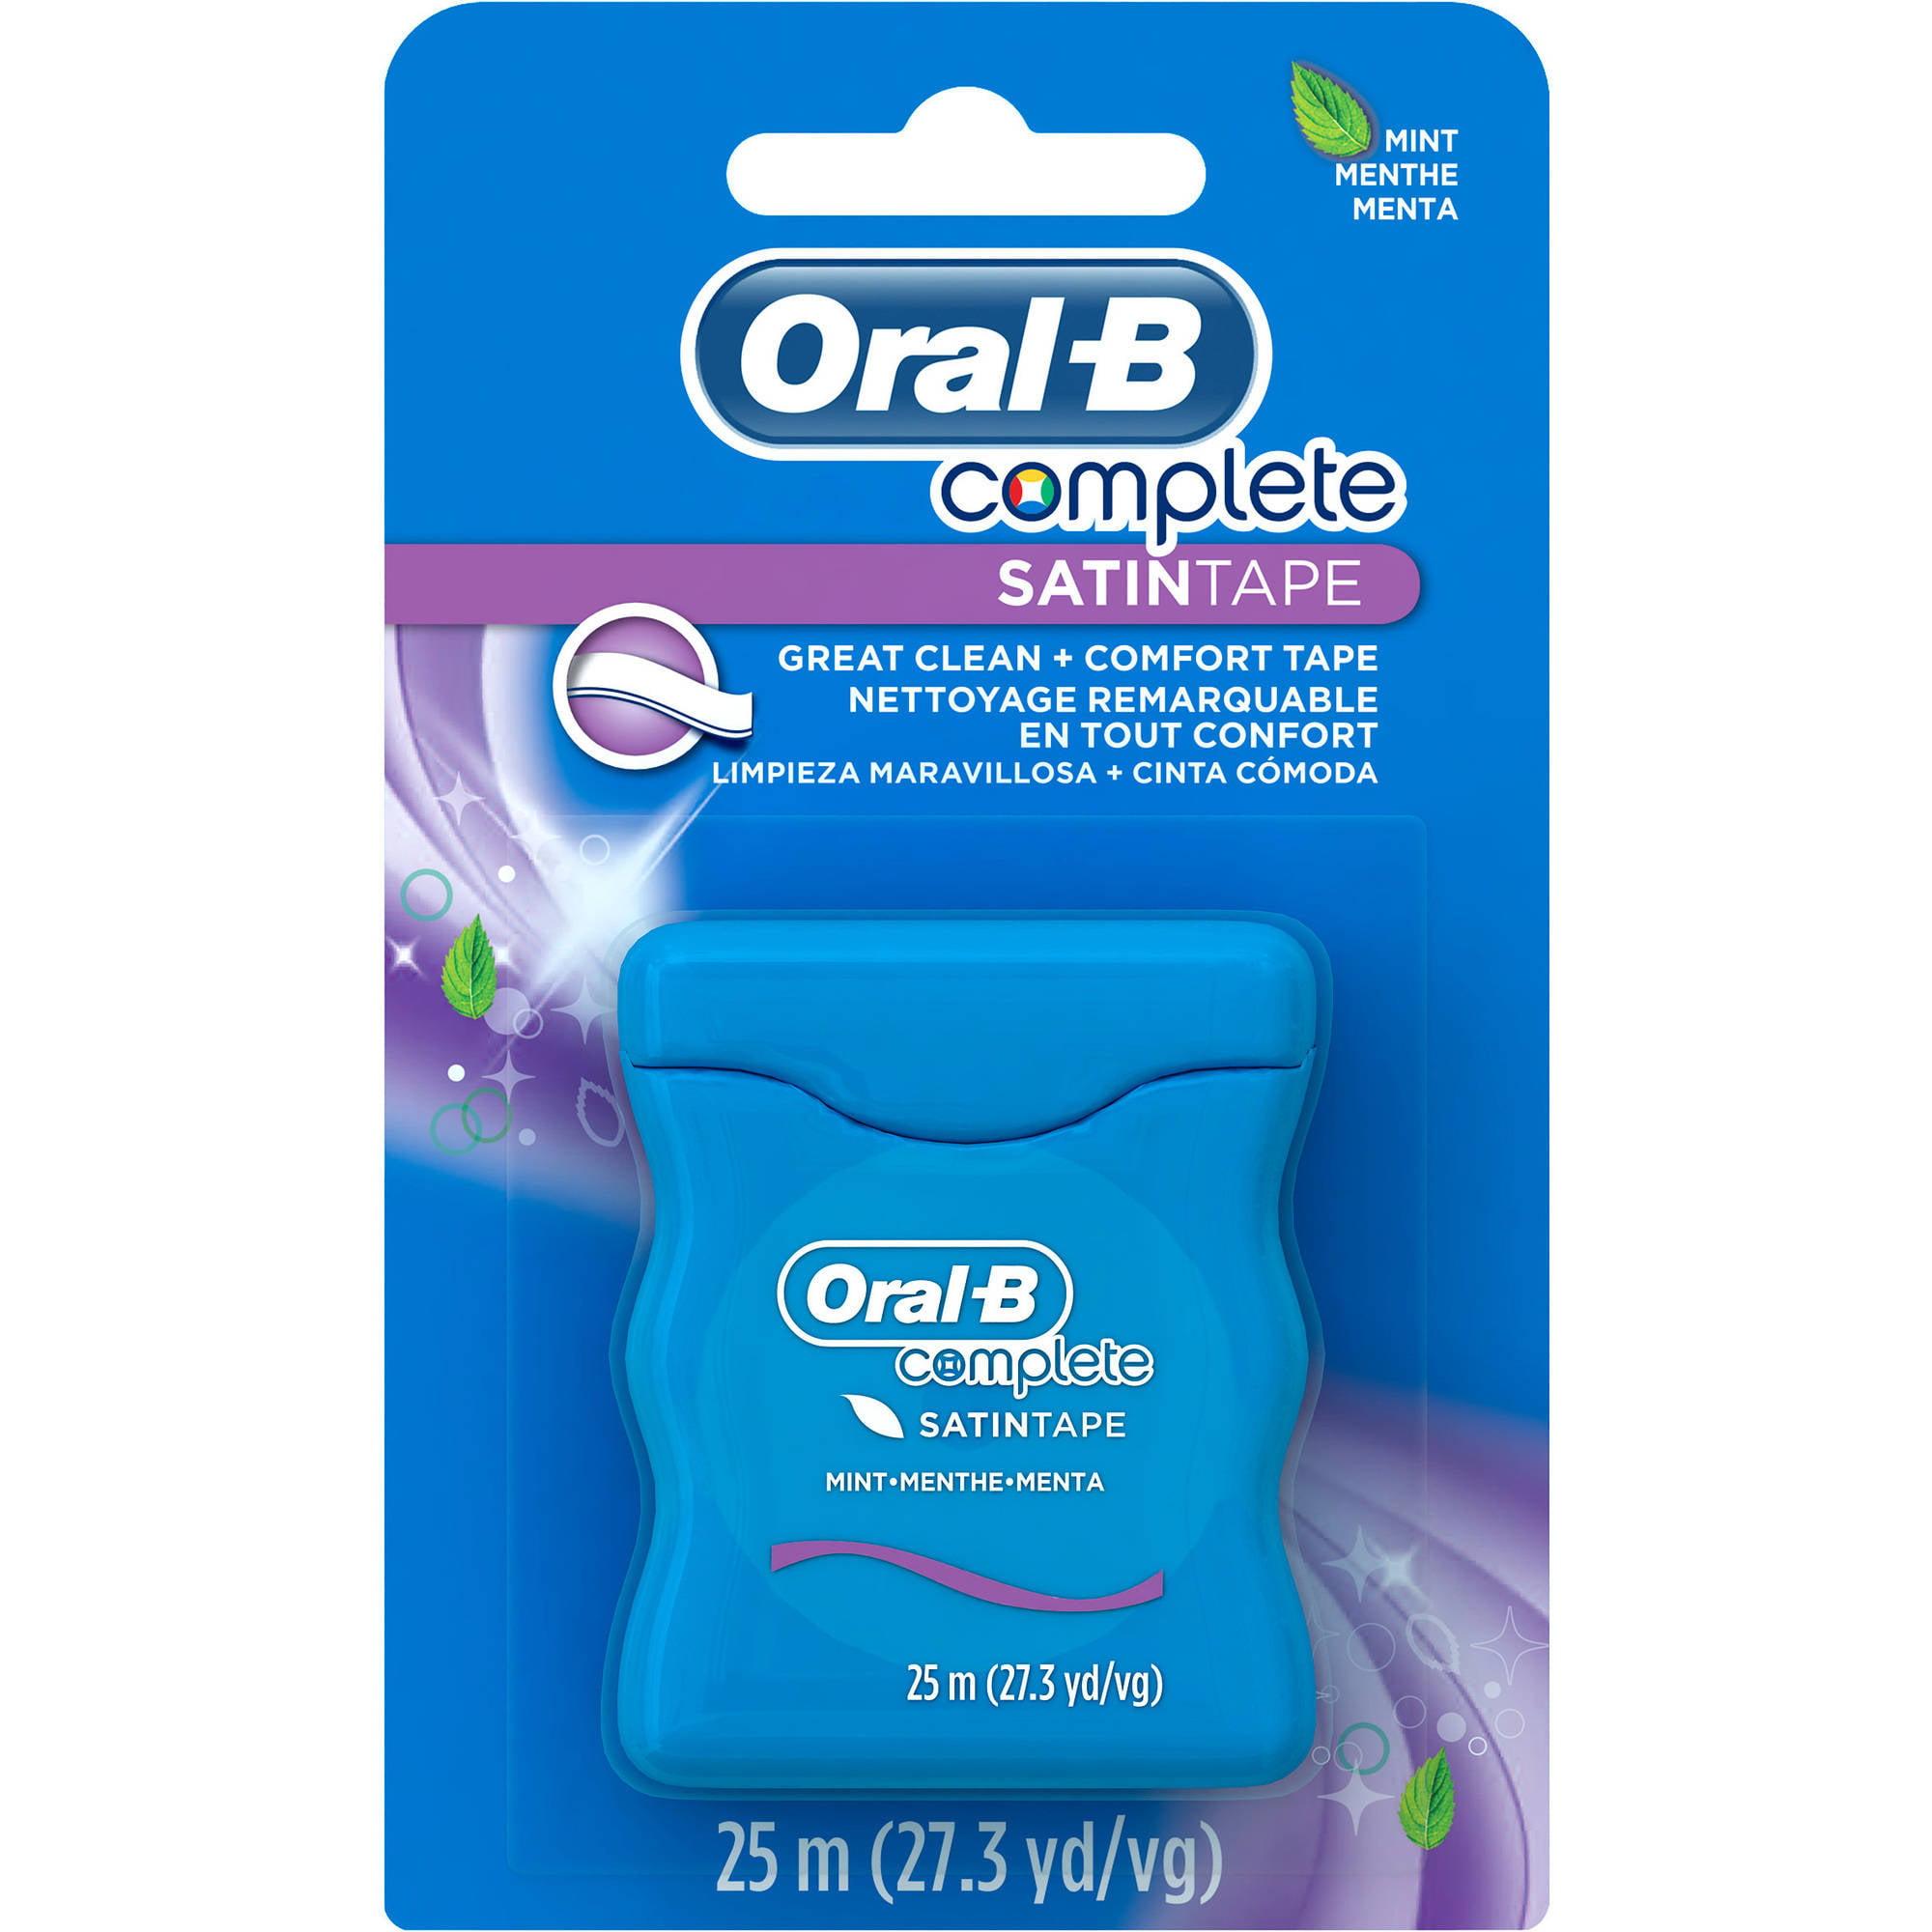 Oral B Satin Tape - 1 Ct